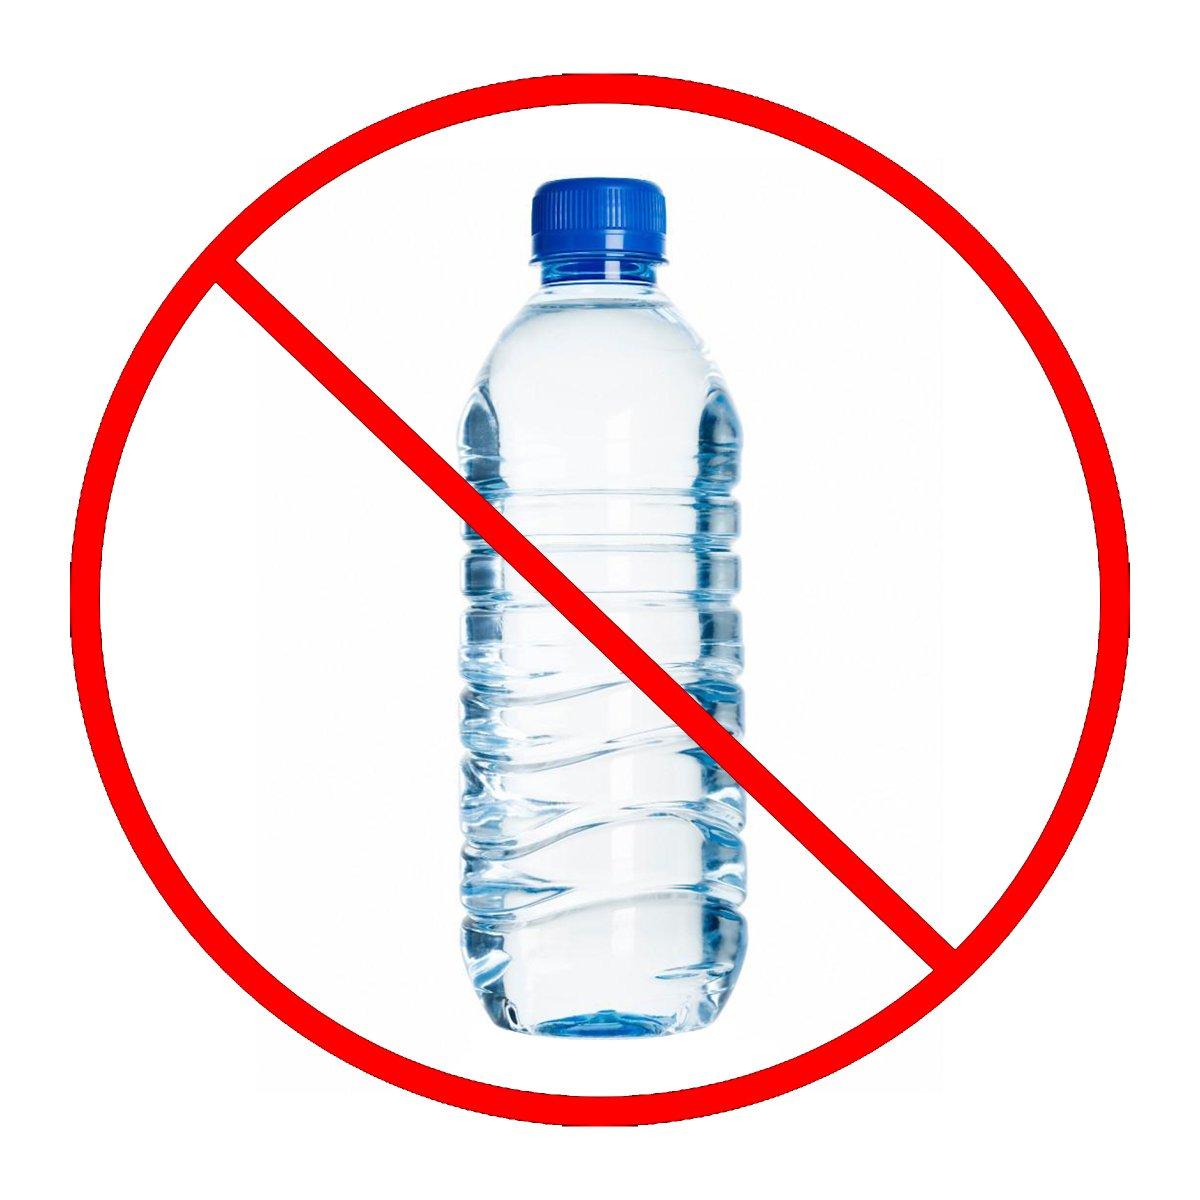 No more single-use #water bottles. #5WordWishForTheFuture <br>http://pic.twitter.com/Wmm02XxBQV